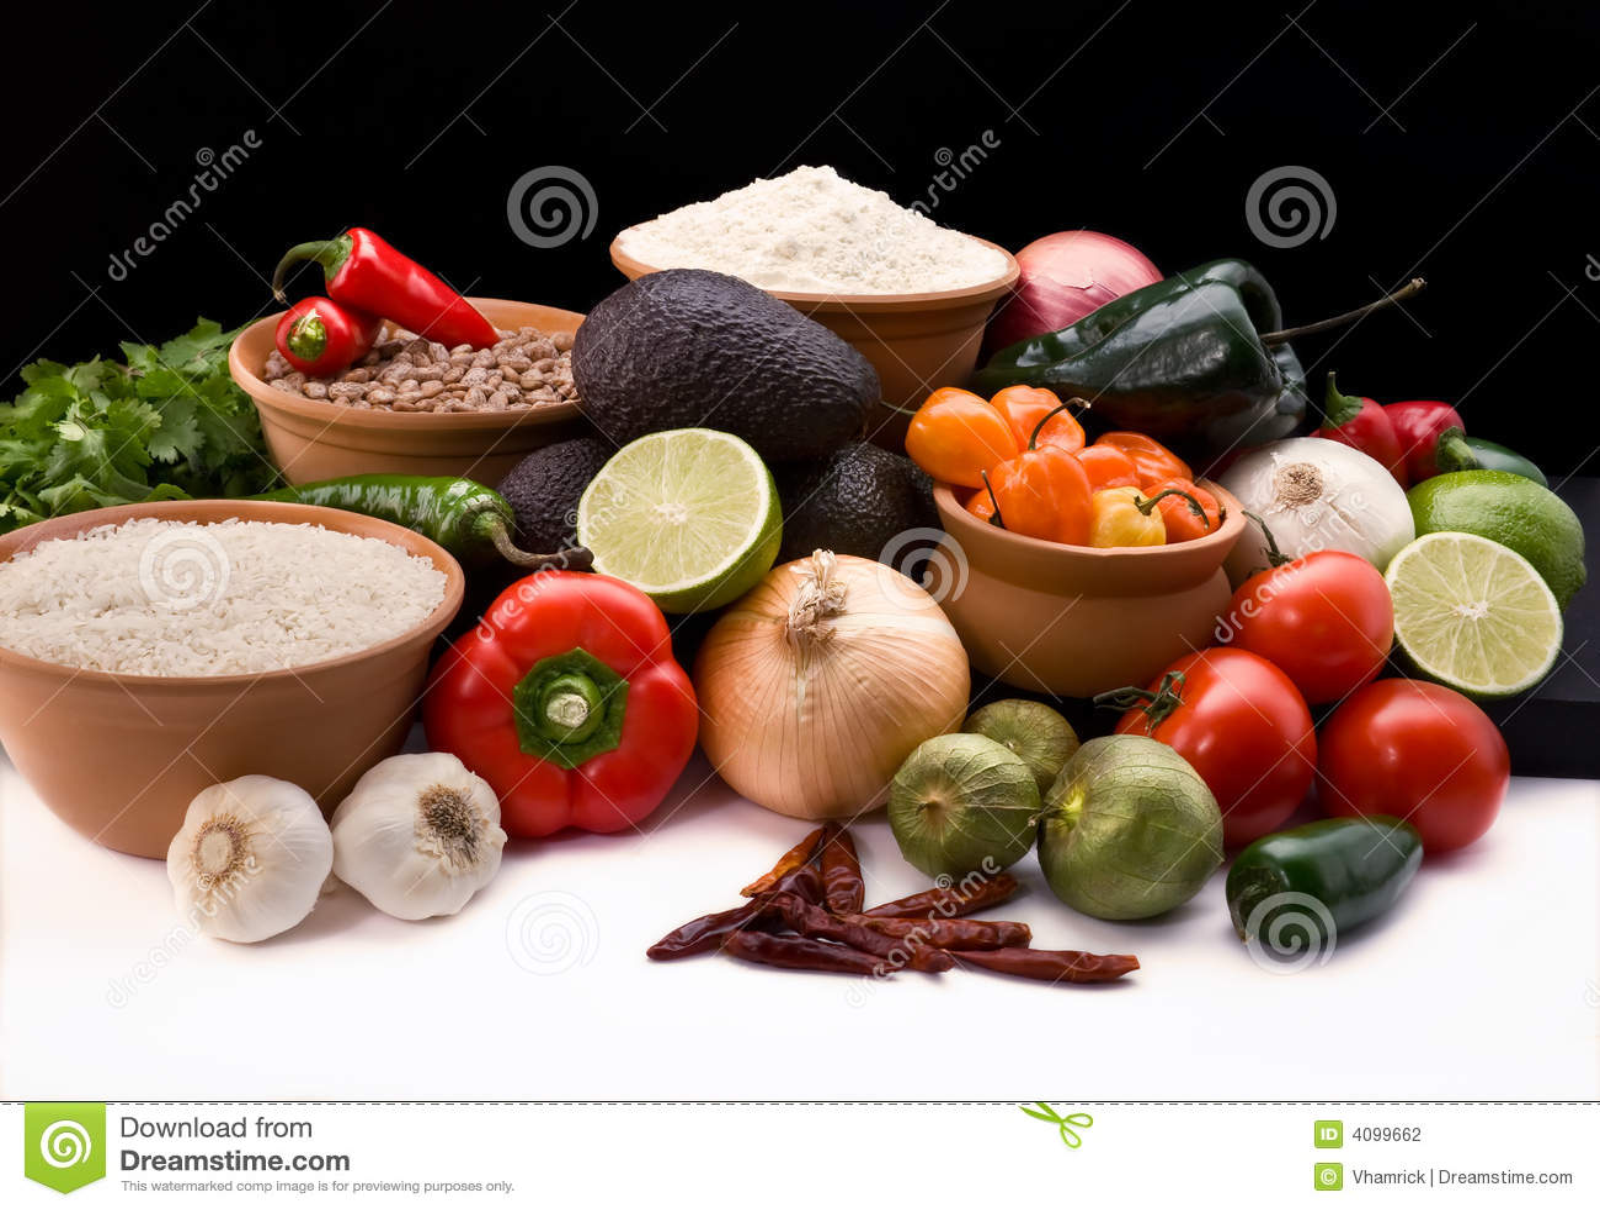 Comida mexicana for Ingredientes para comida